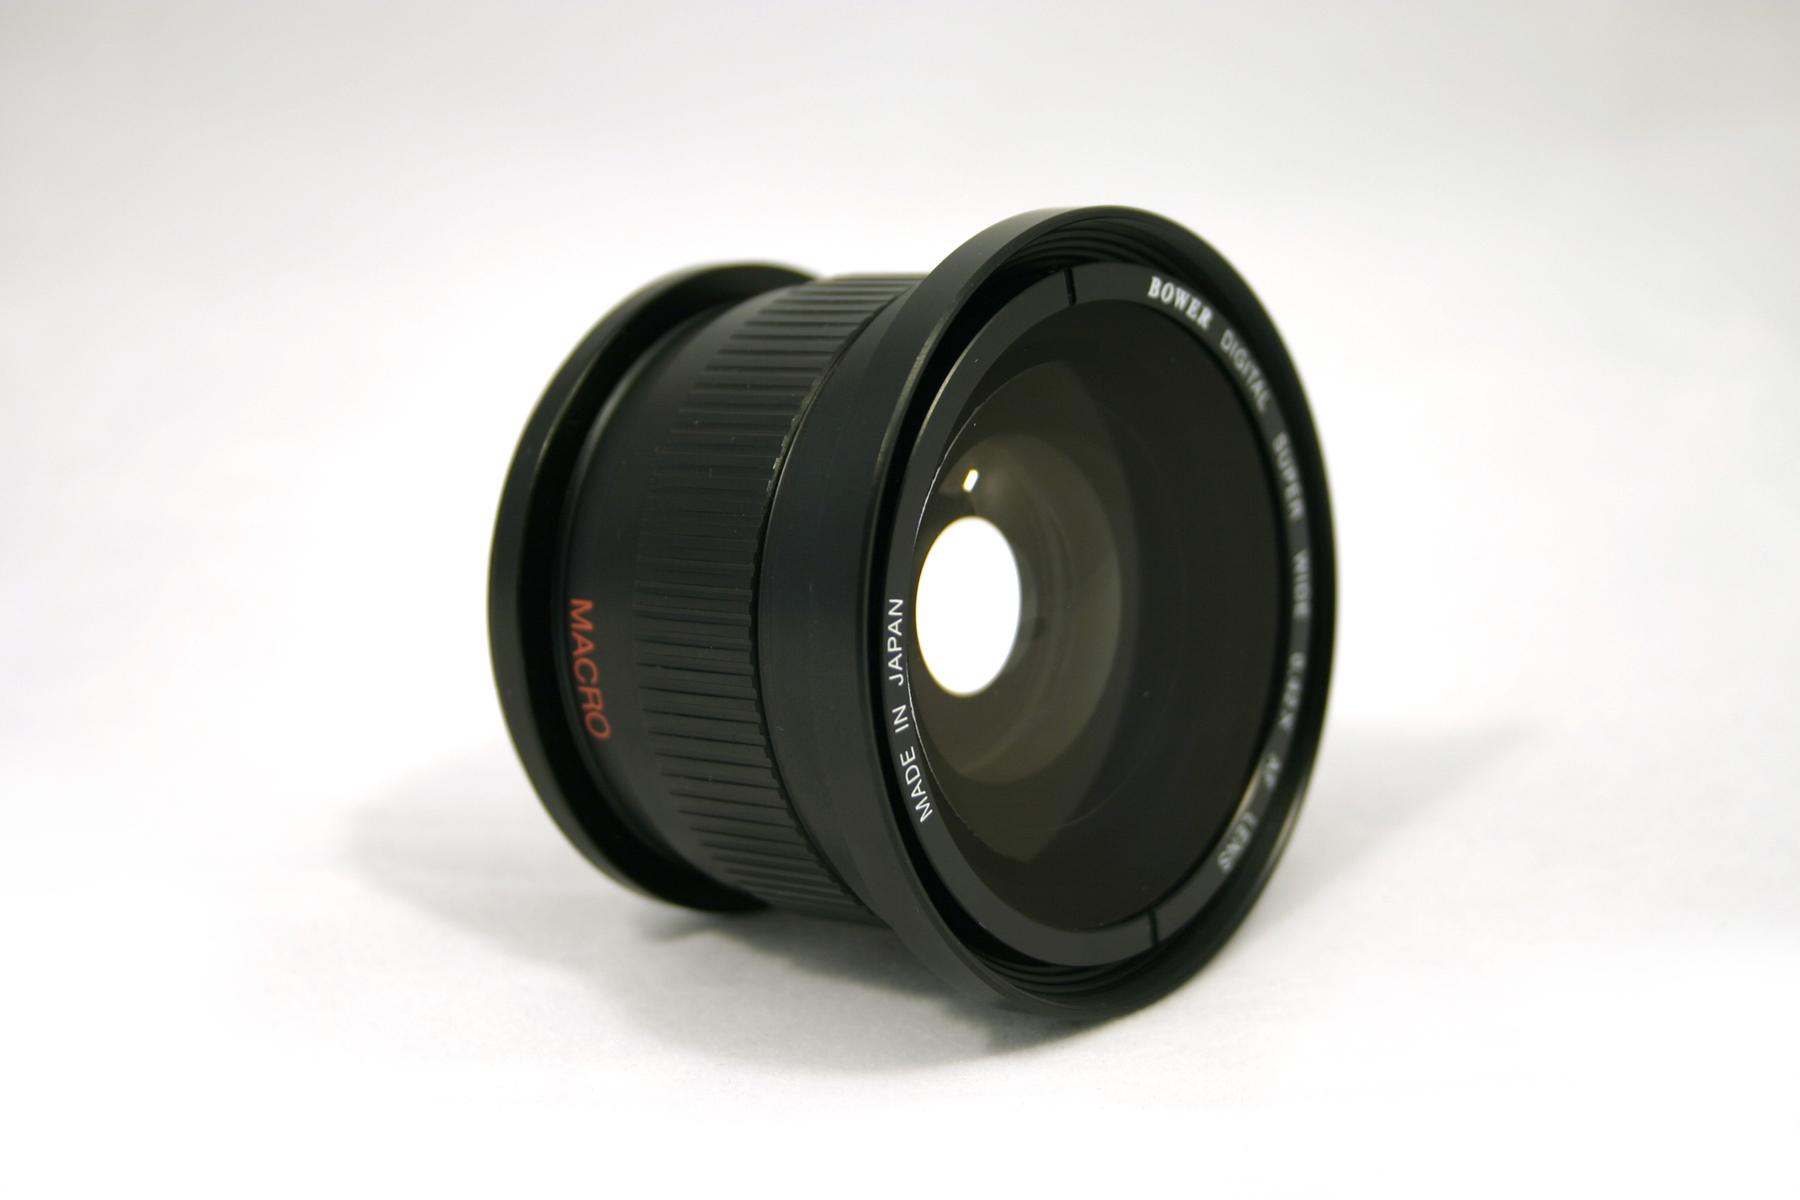 Camera lense photo